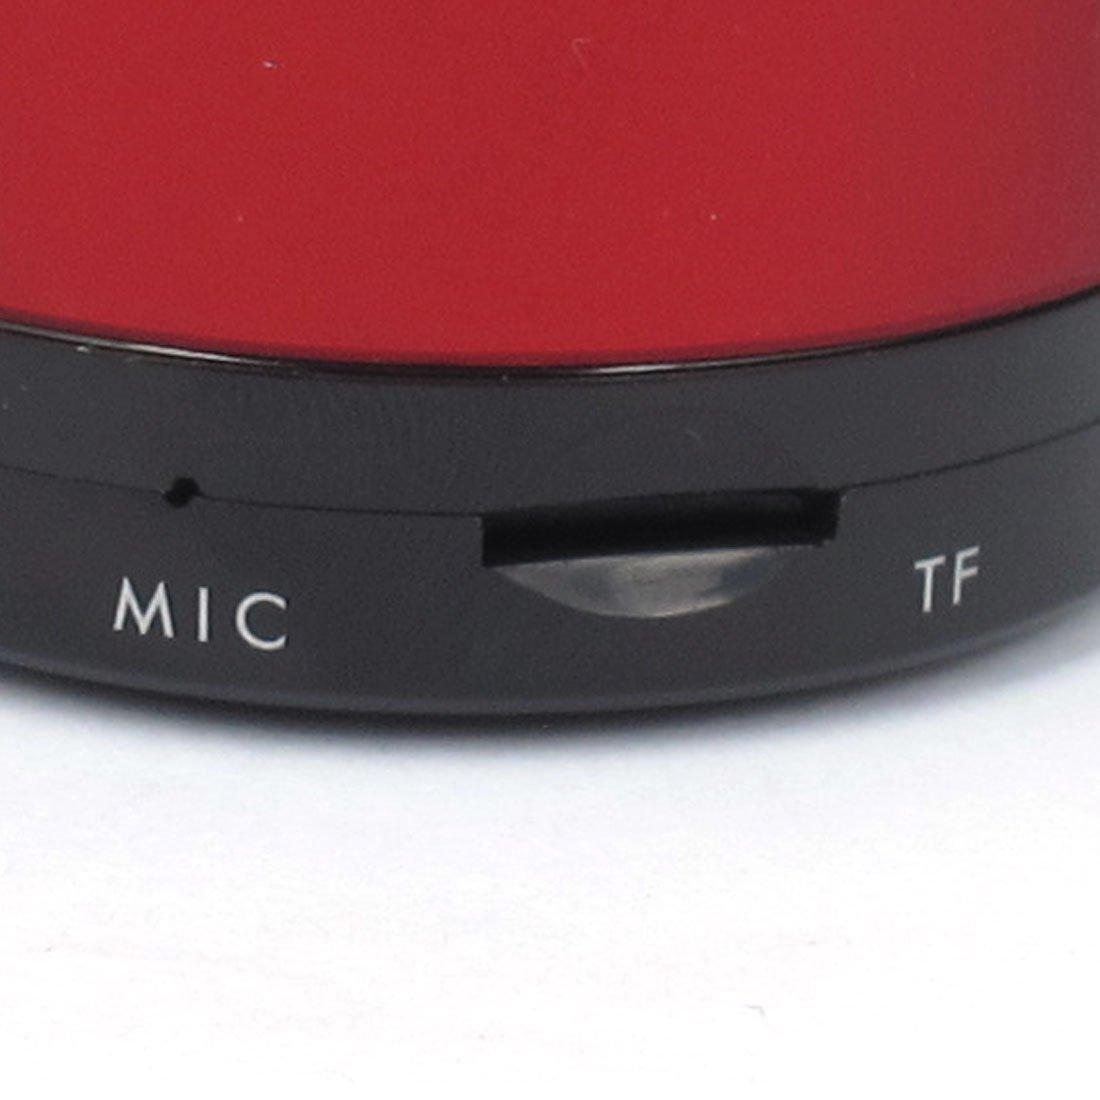 Amazon.com: MP3 Teléfono portátil Bluetooth inalámbrico recargable Mini altavoz Rojo: Home Audio & Theater